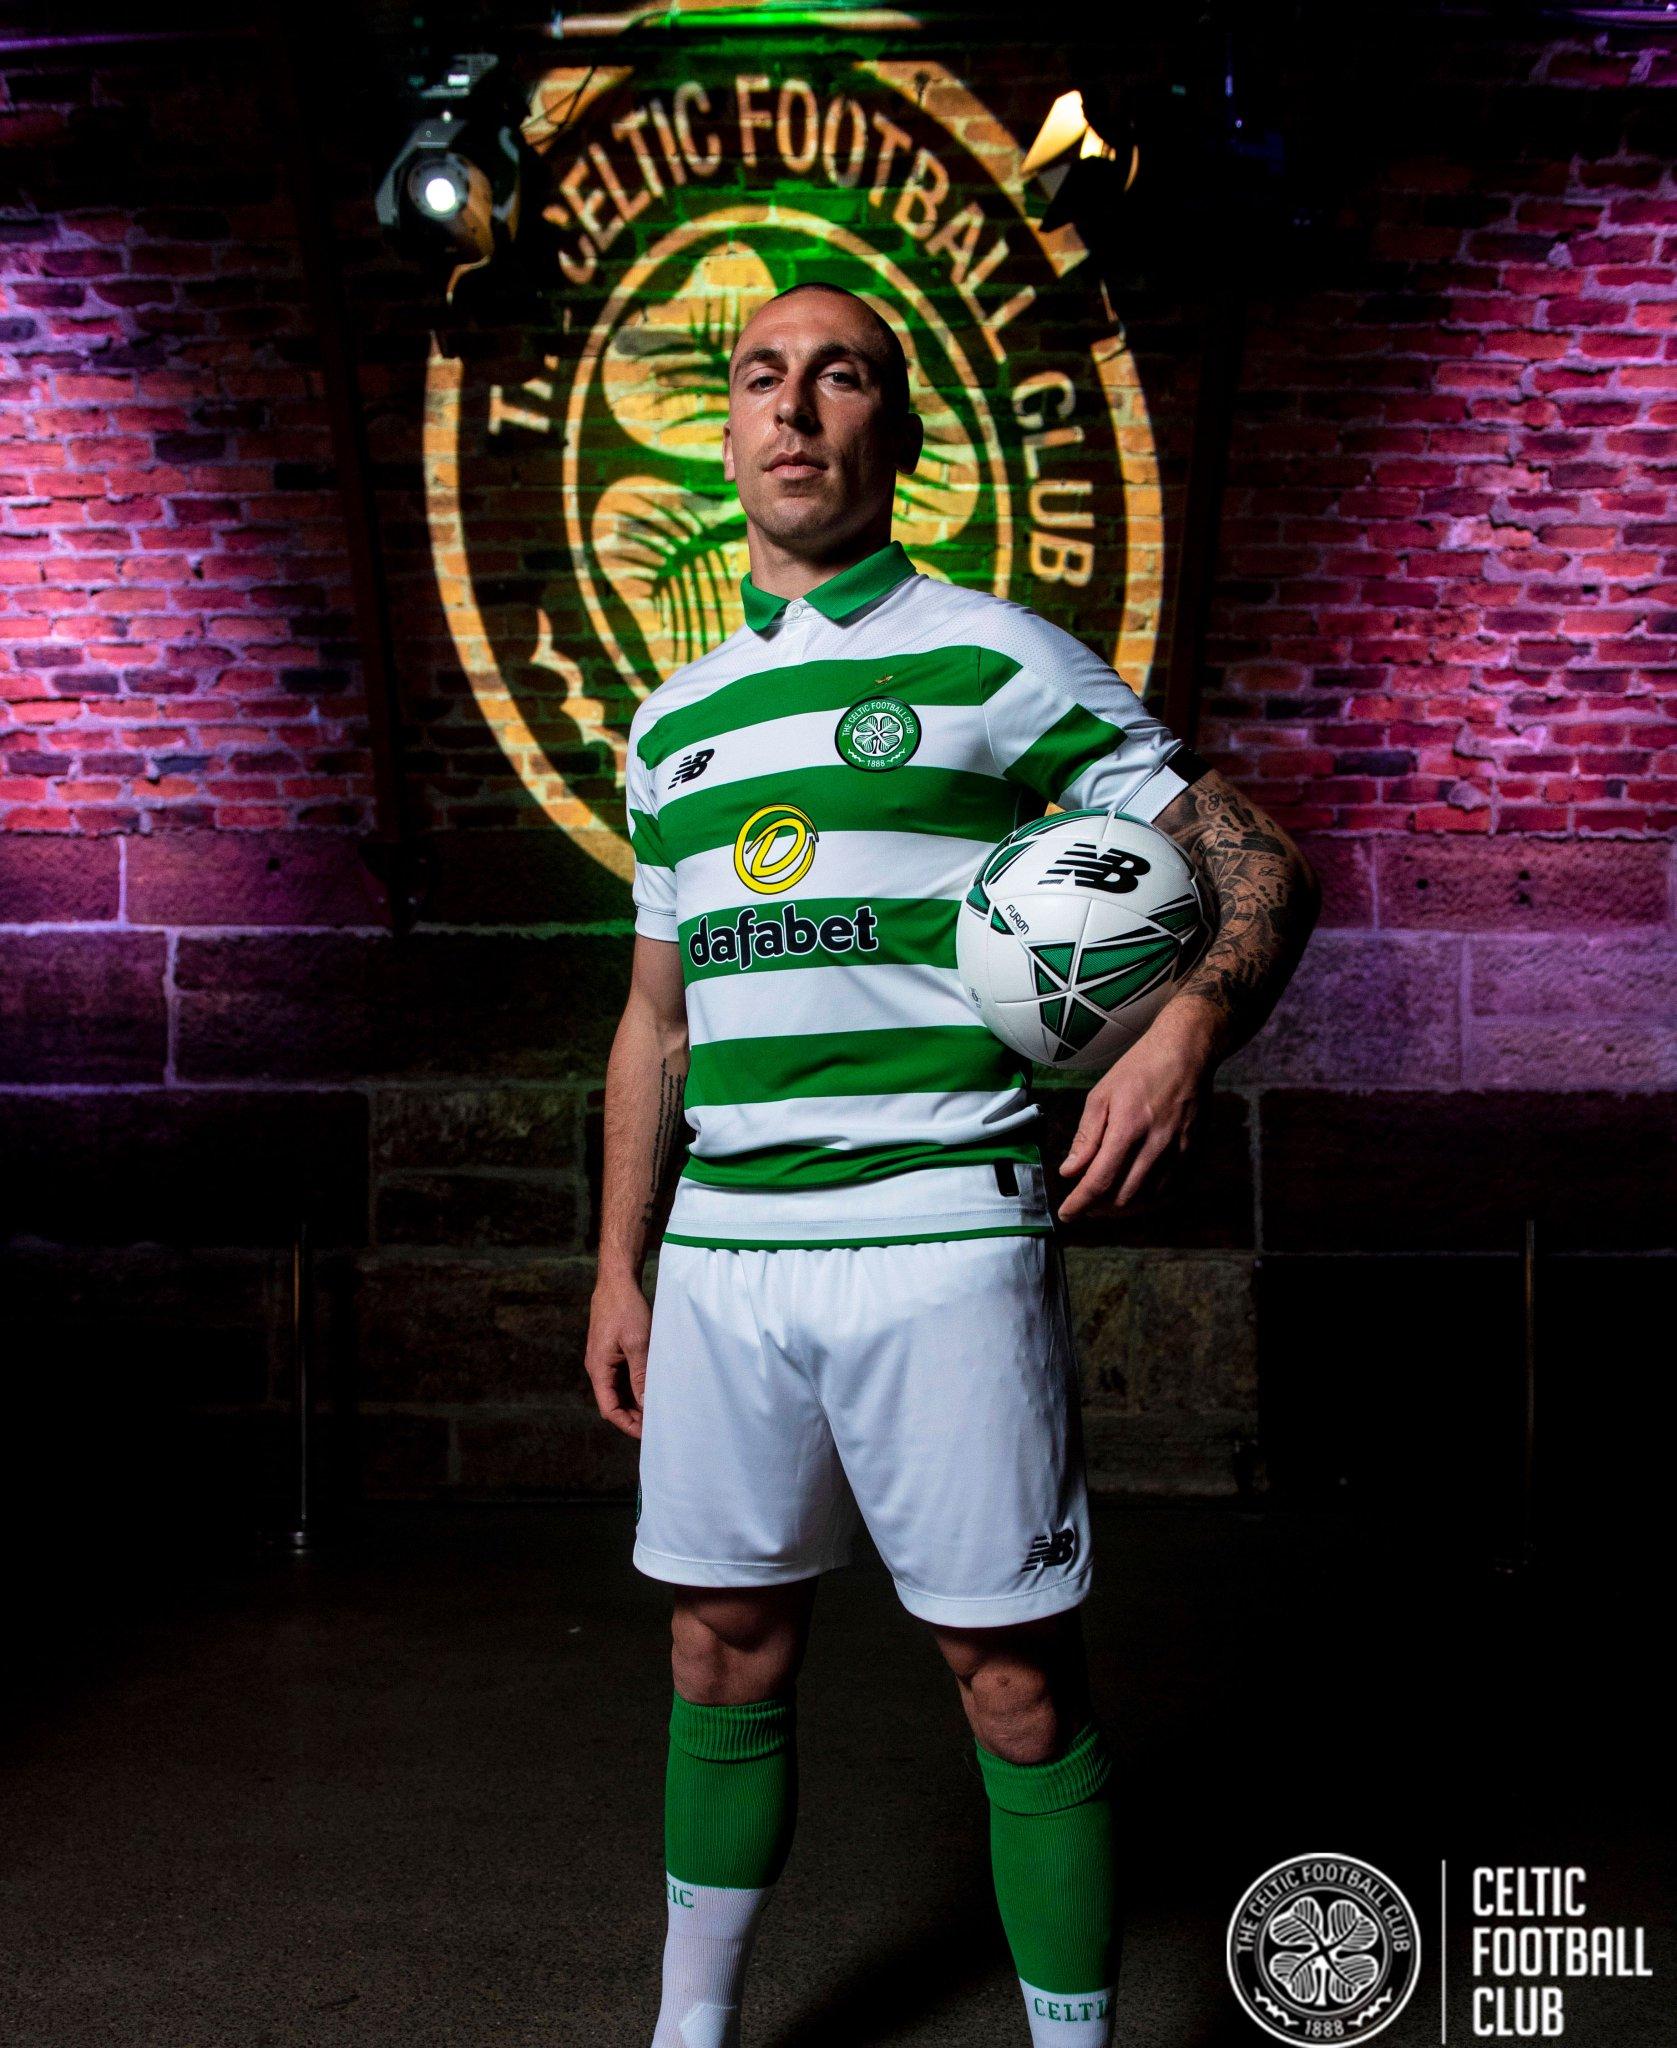 7fe482b21b1 Celtic Football Club on Twitter